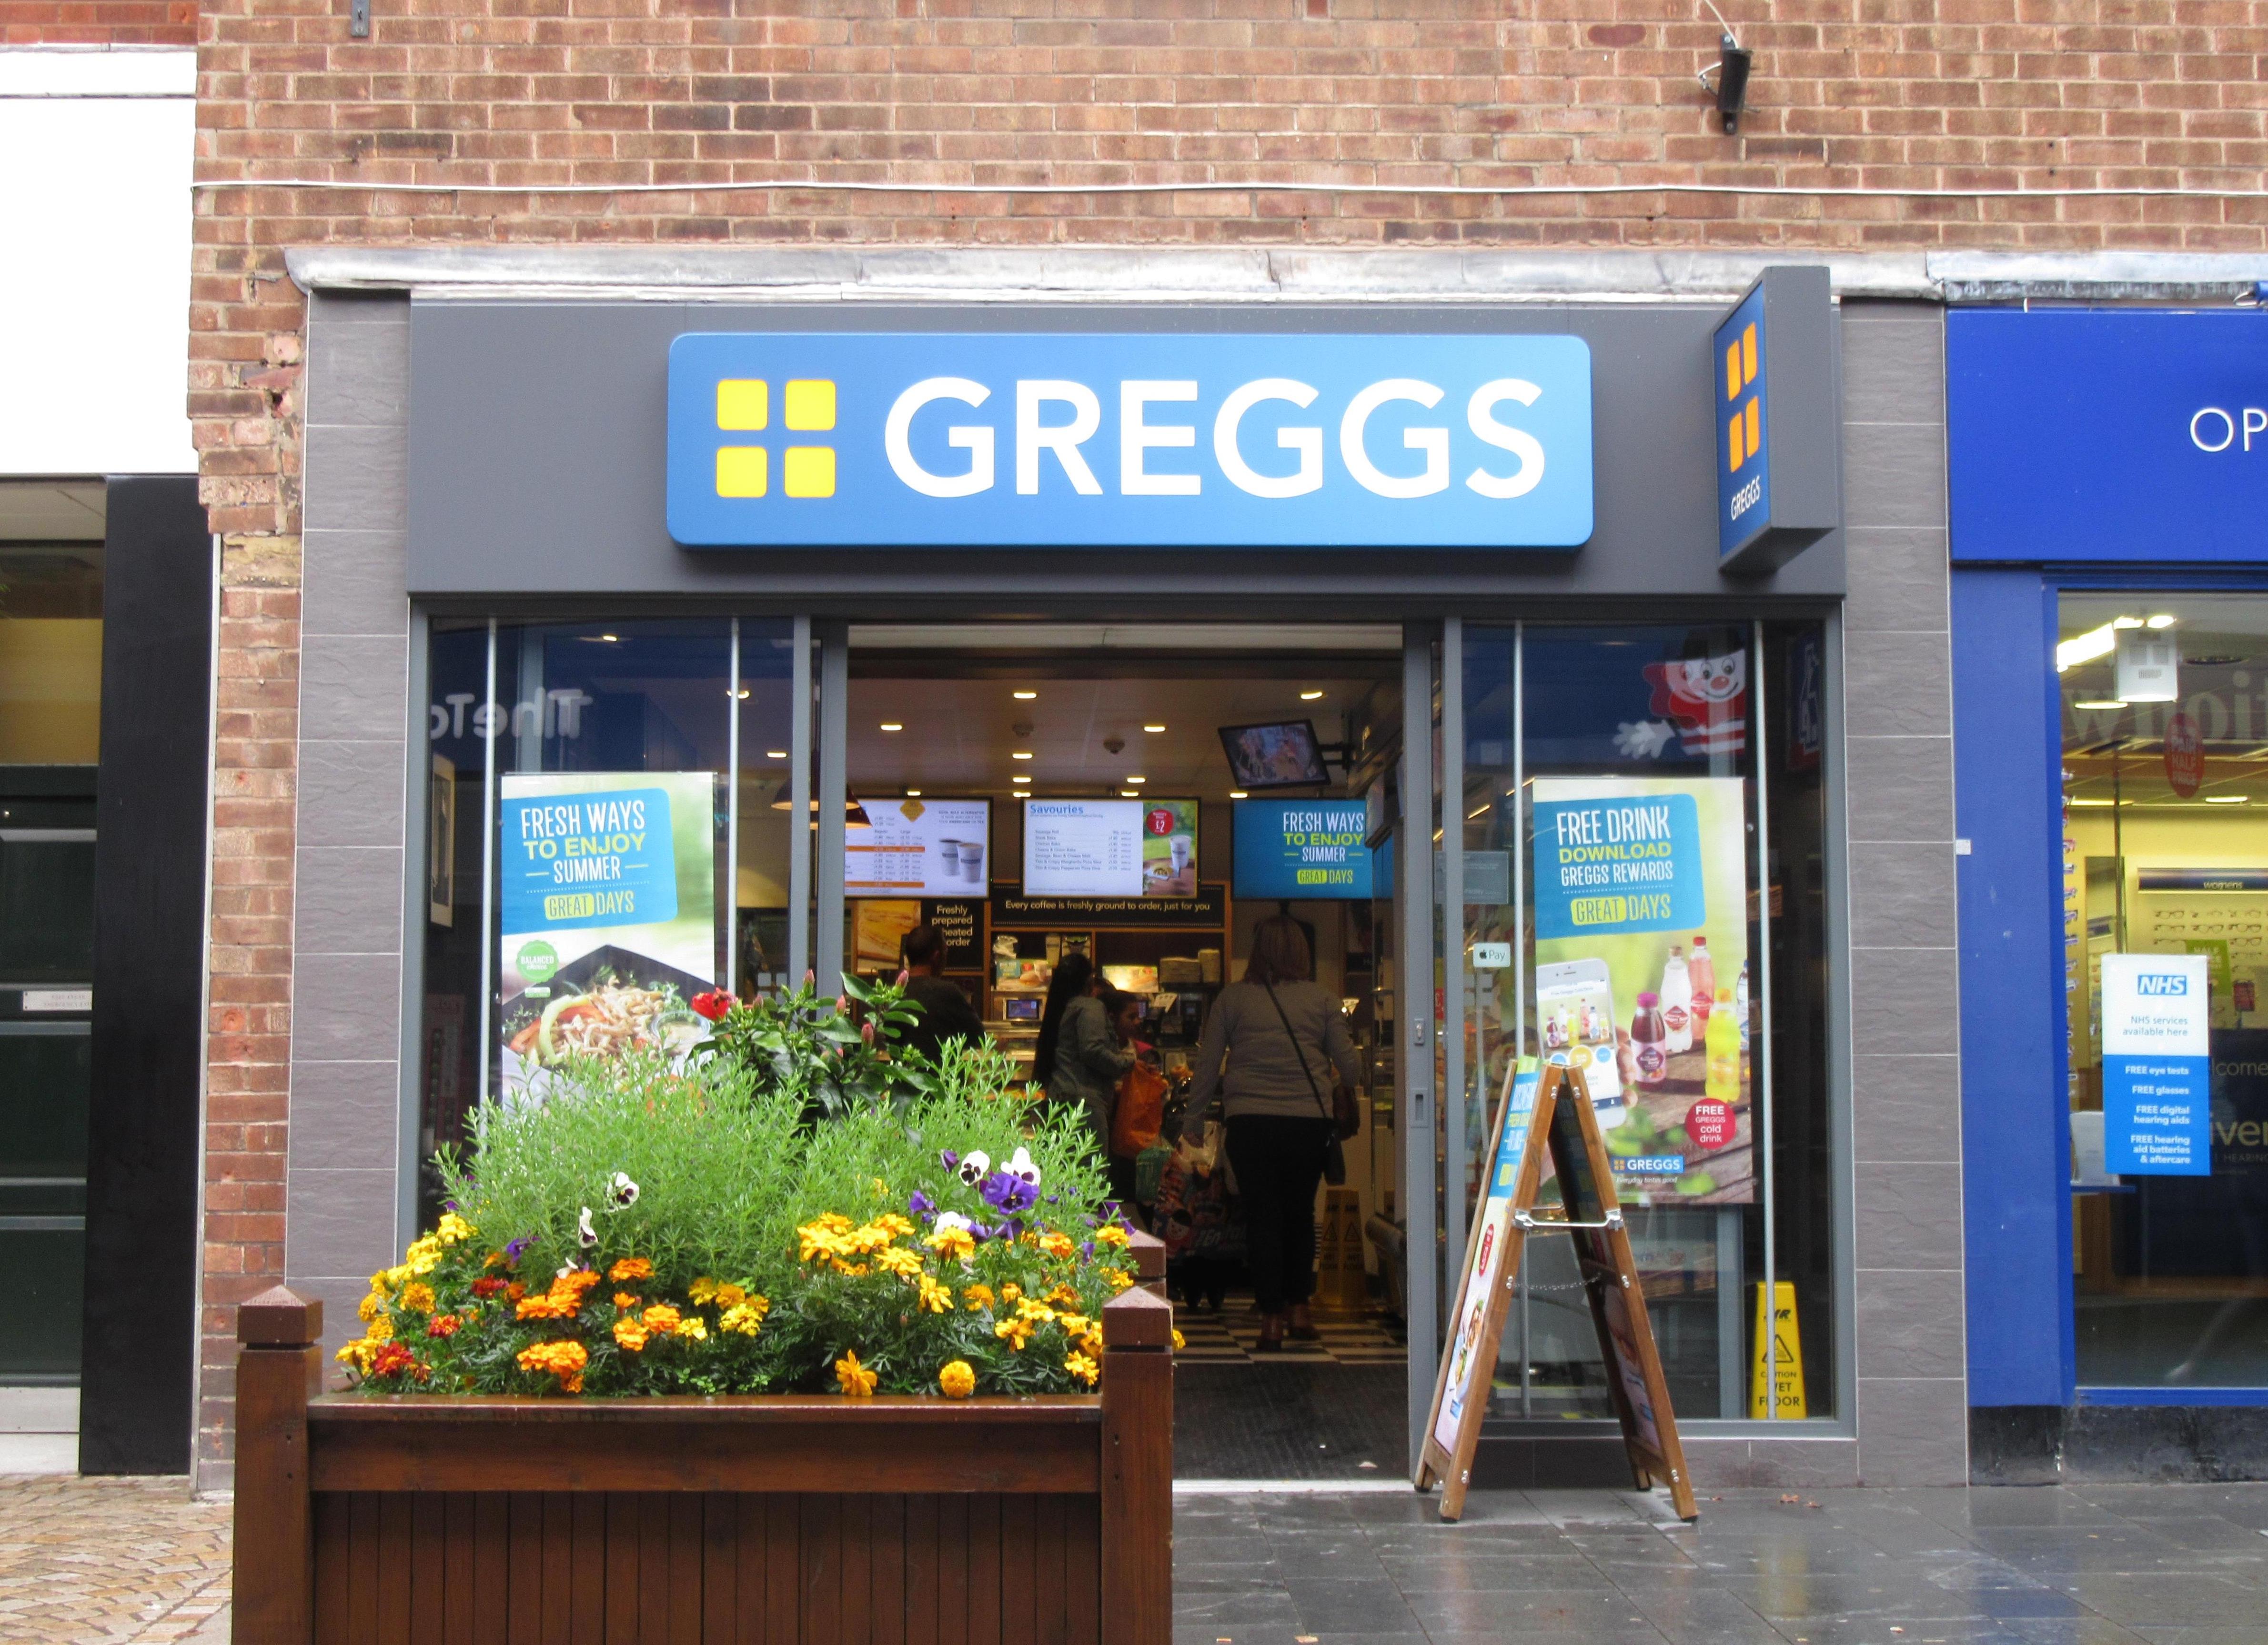 Greggs - WA14 1RH.jpg